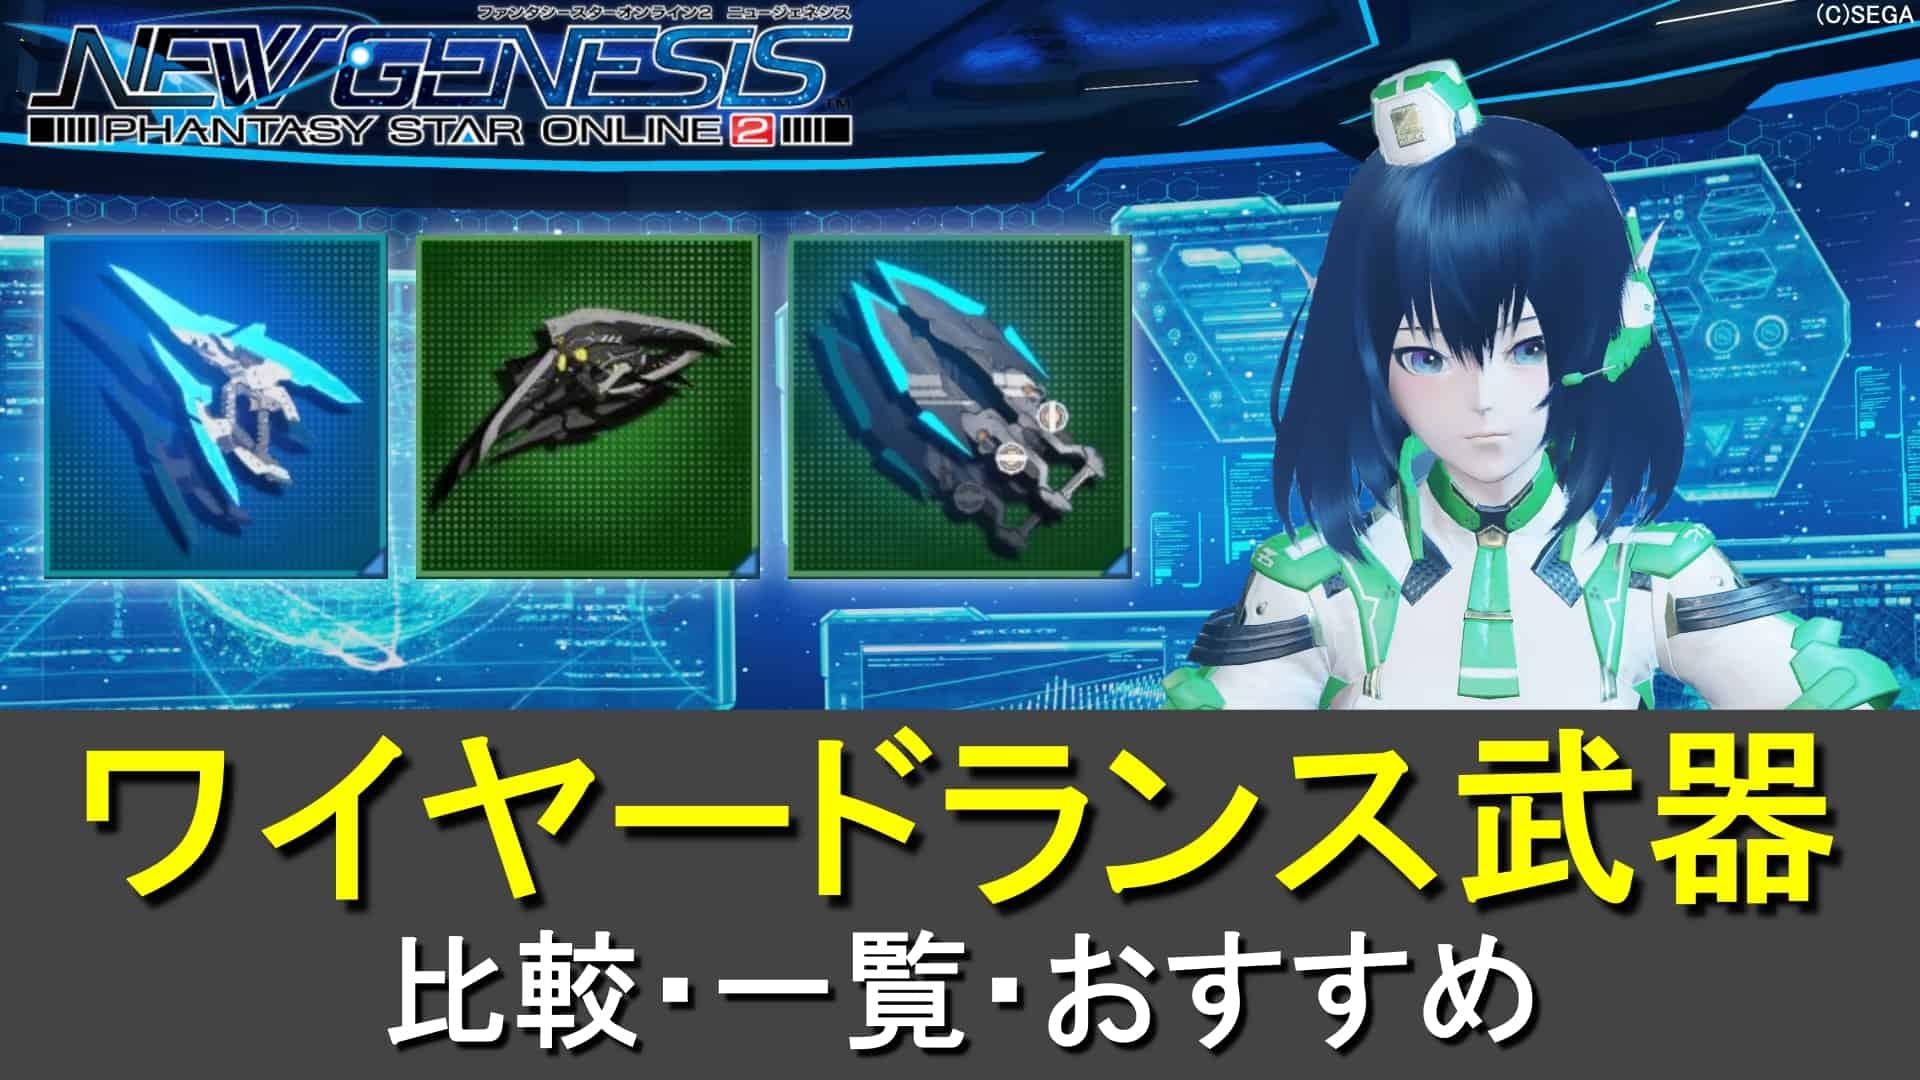 【PSO2NGS】ワイヤードランス武器の一覧、潜在まとめ